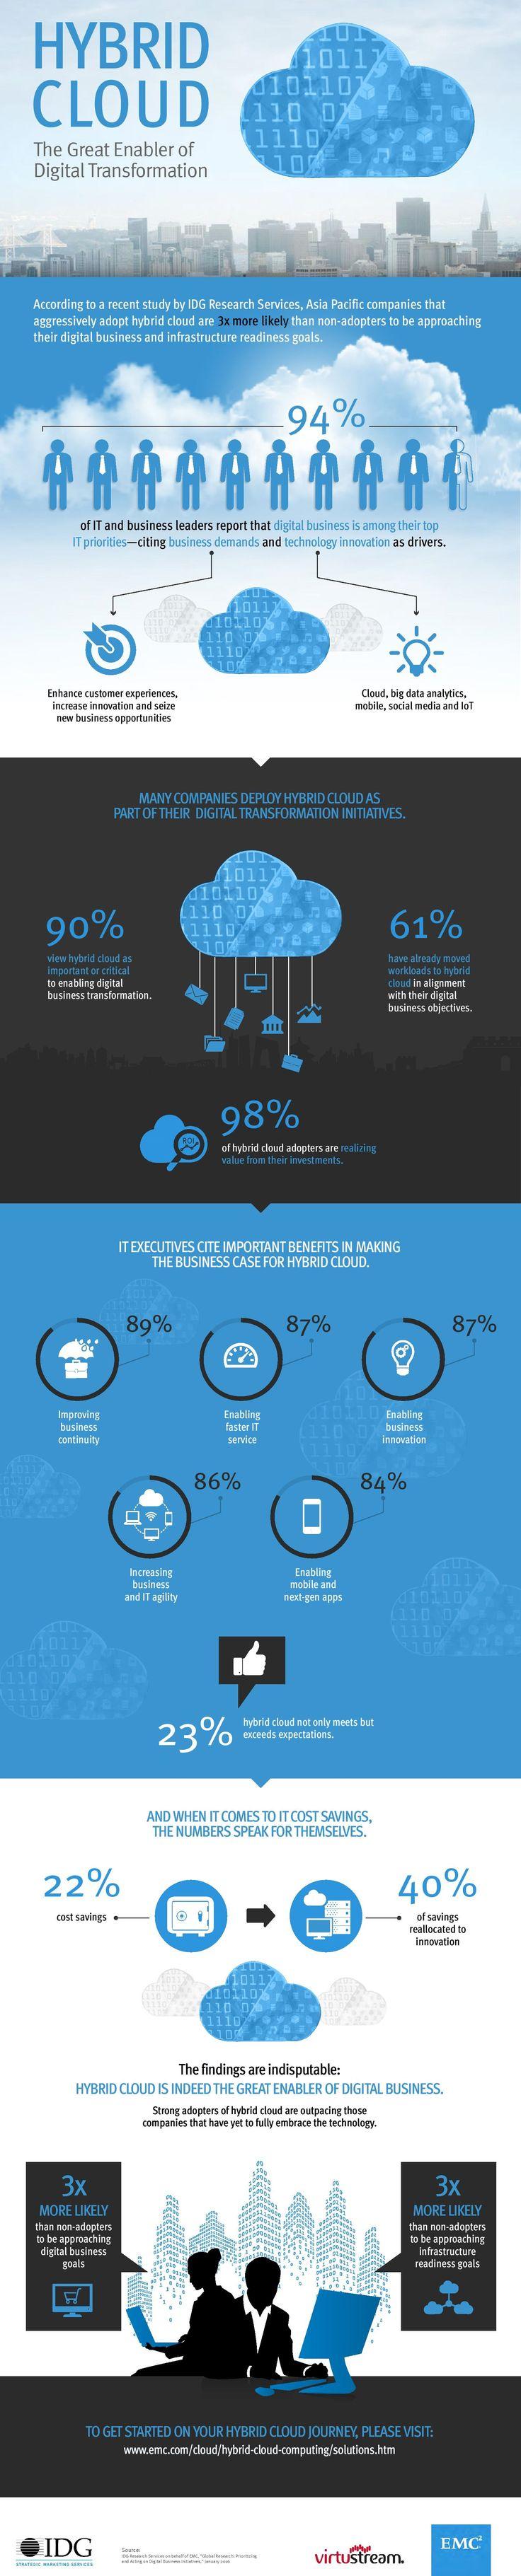 Infographic: Hybrid cloud enables digital transformation | Cloud | Enterprise Innovation